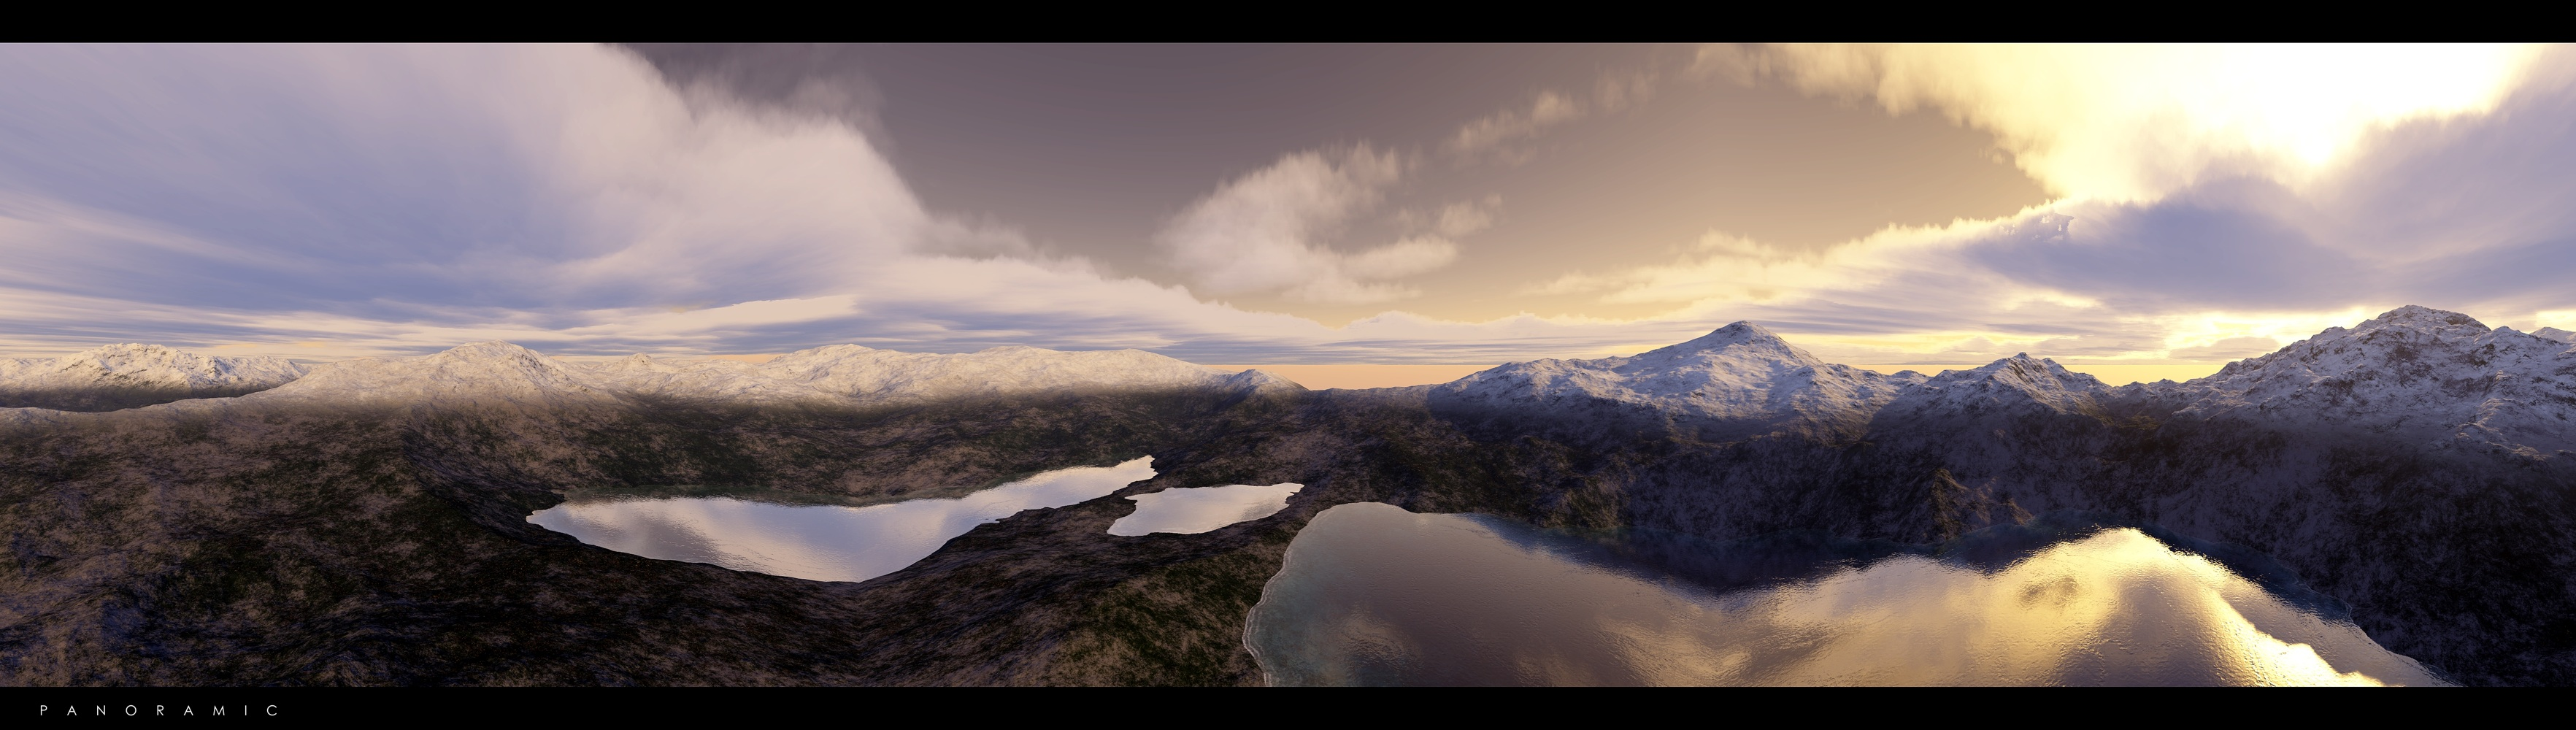 Panoramic by rumun